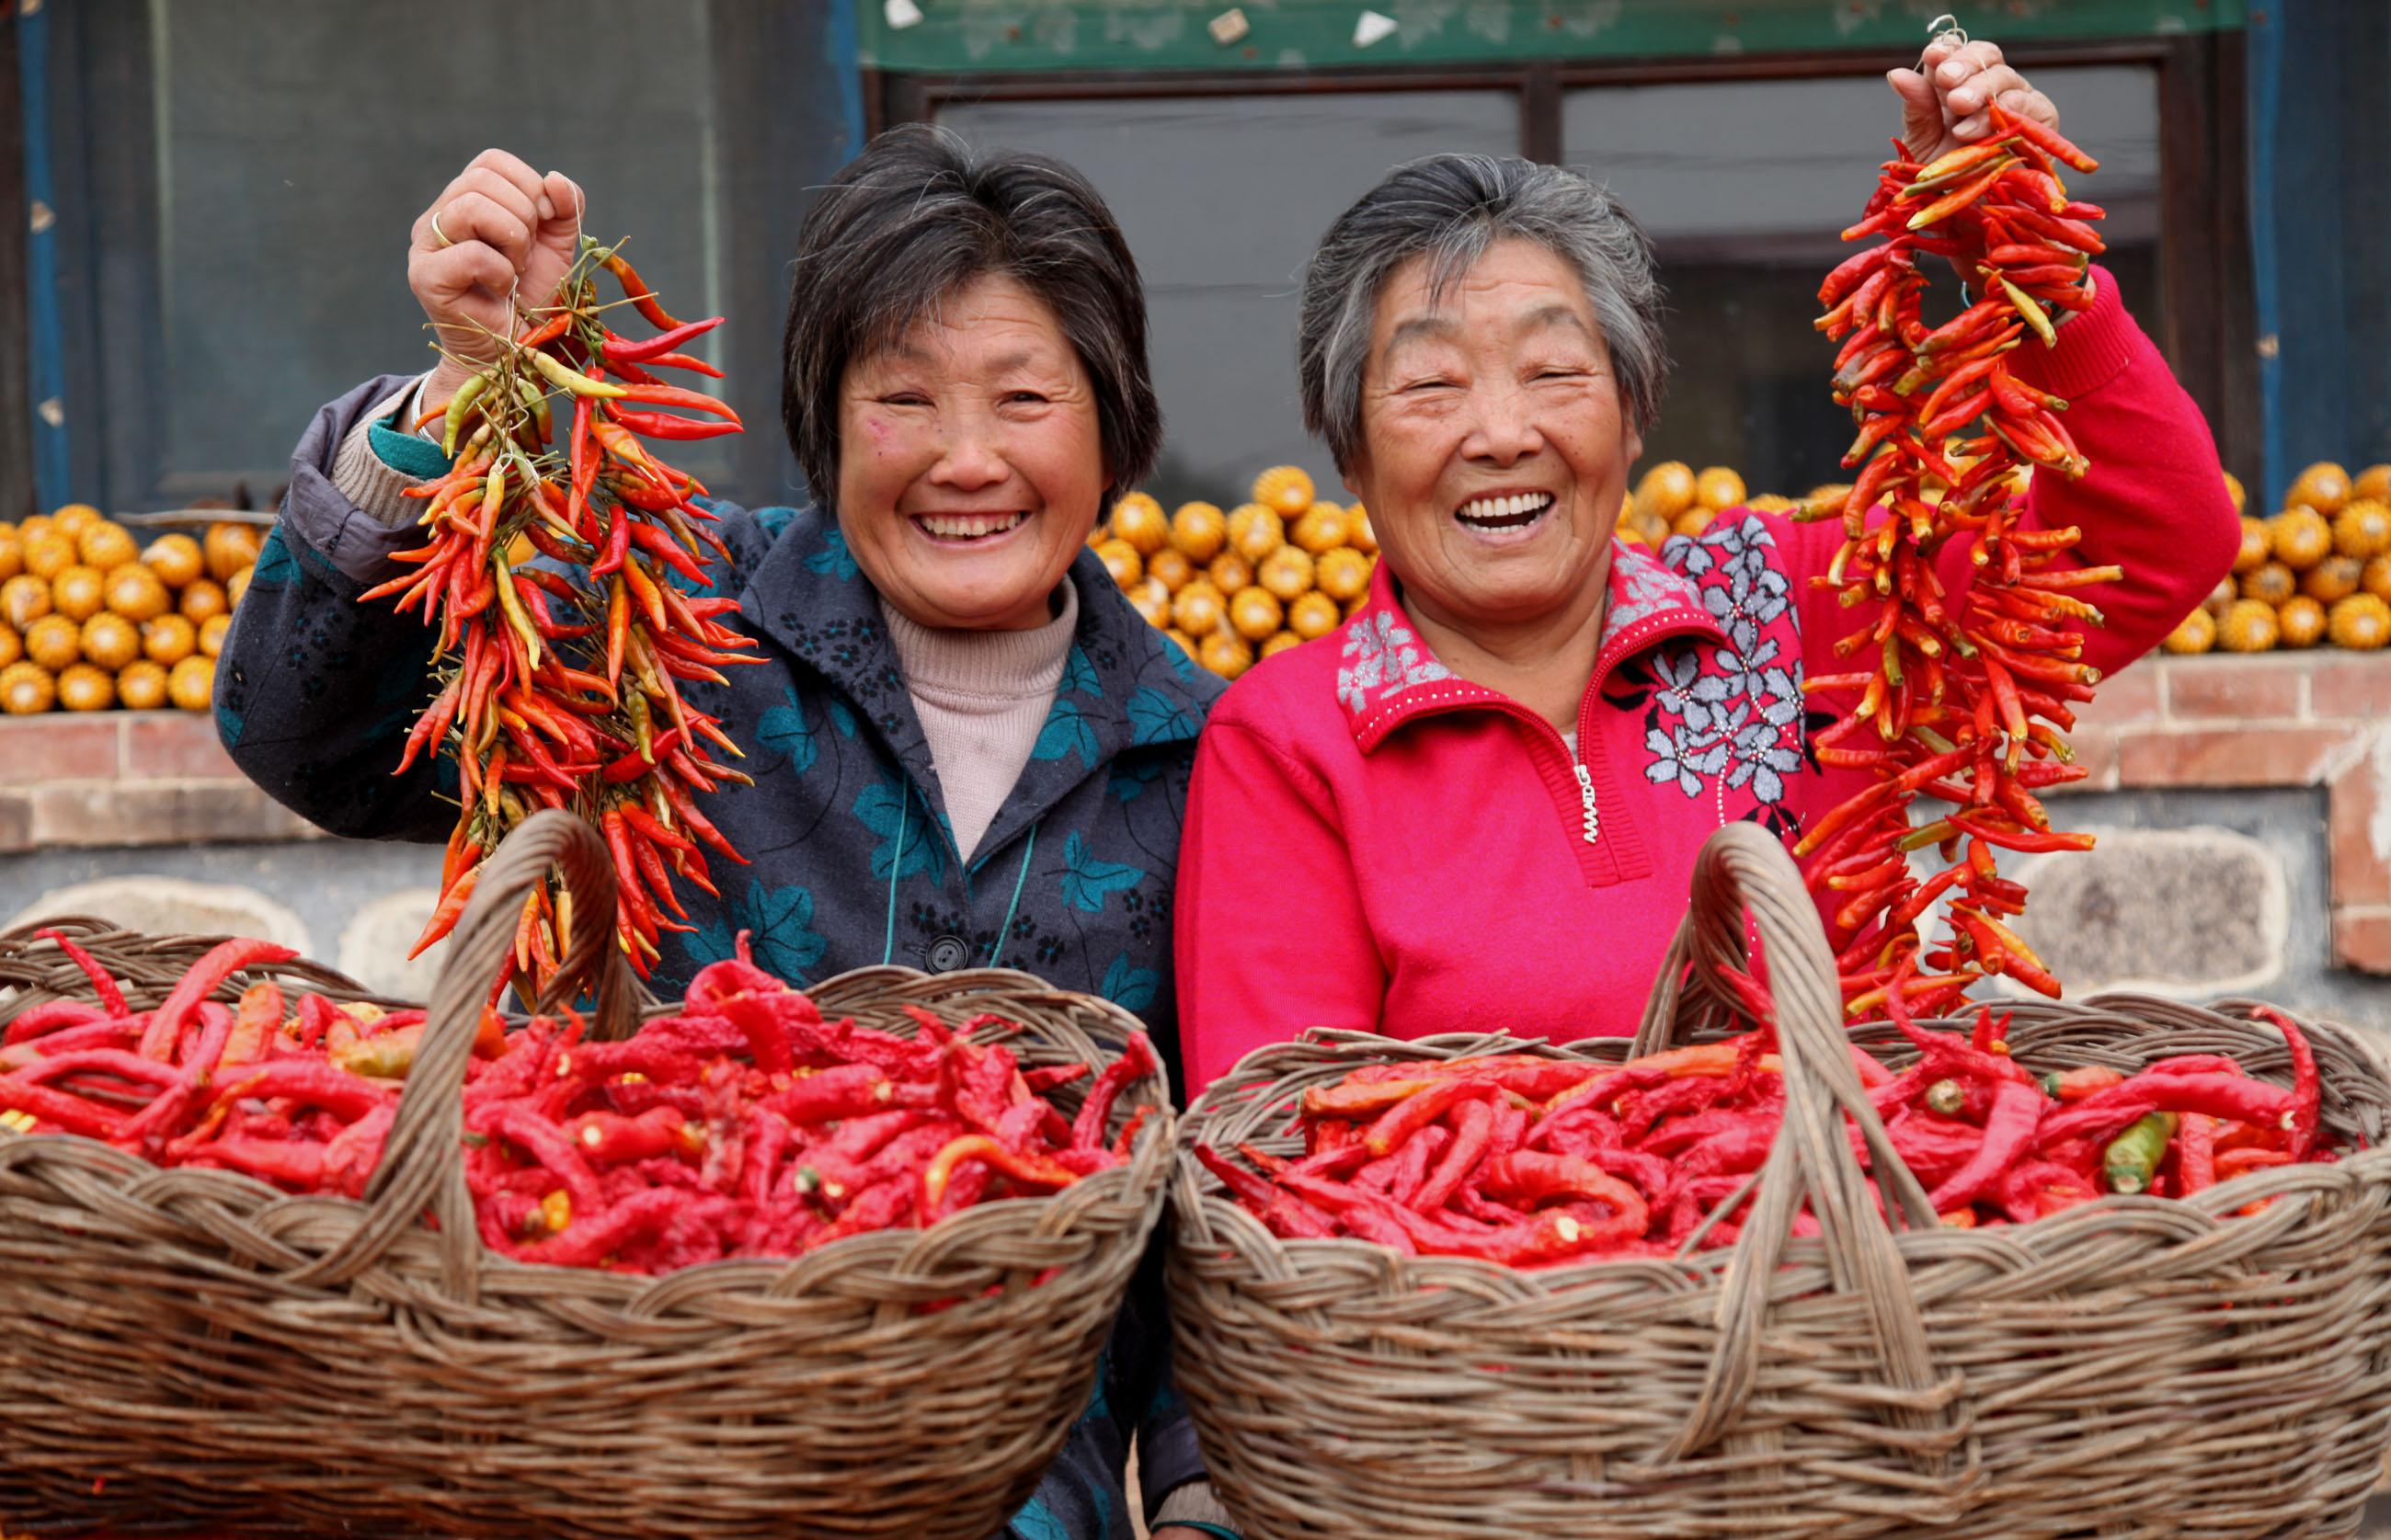 spicy (Array)